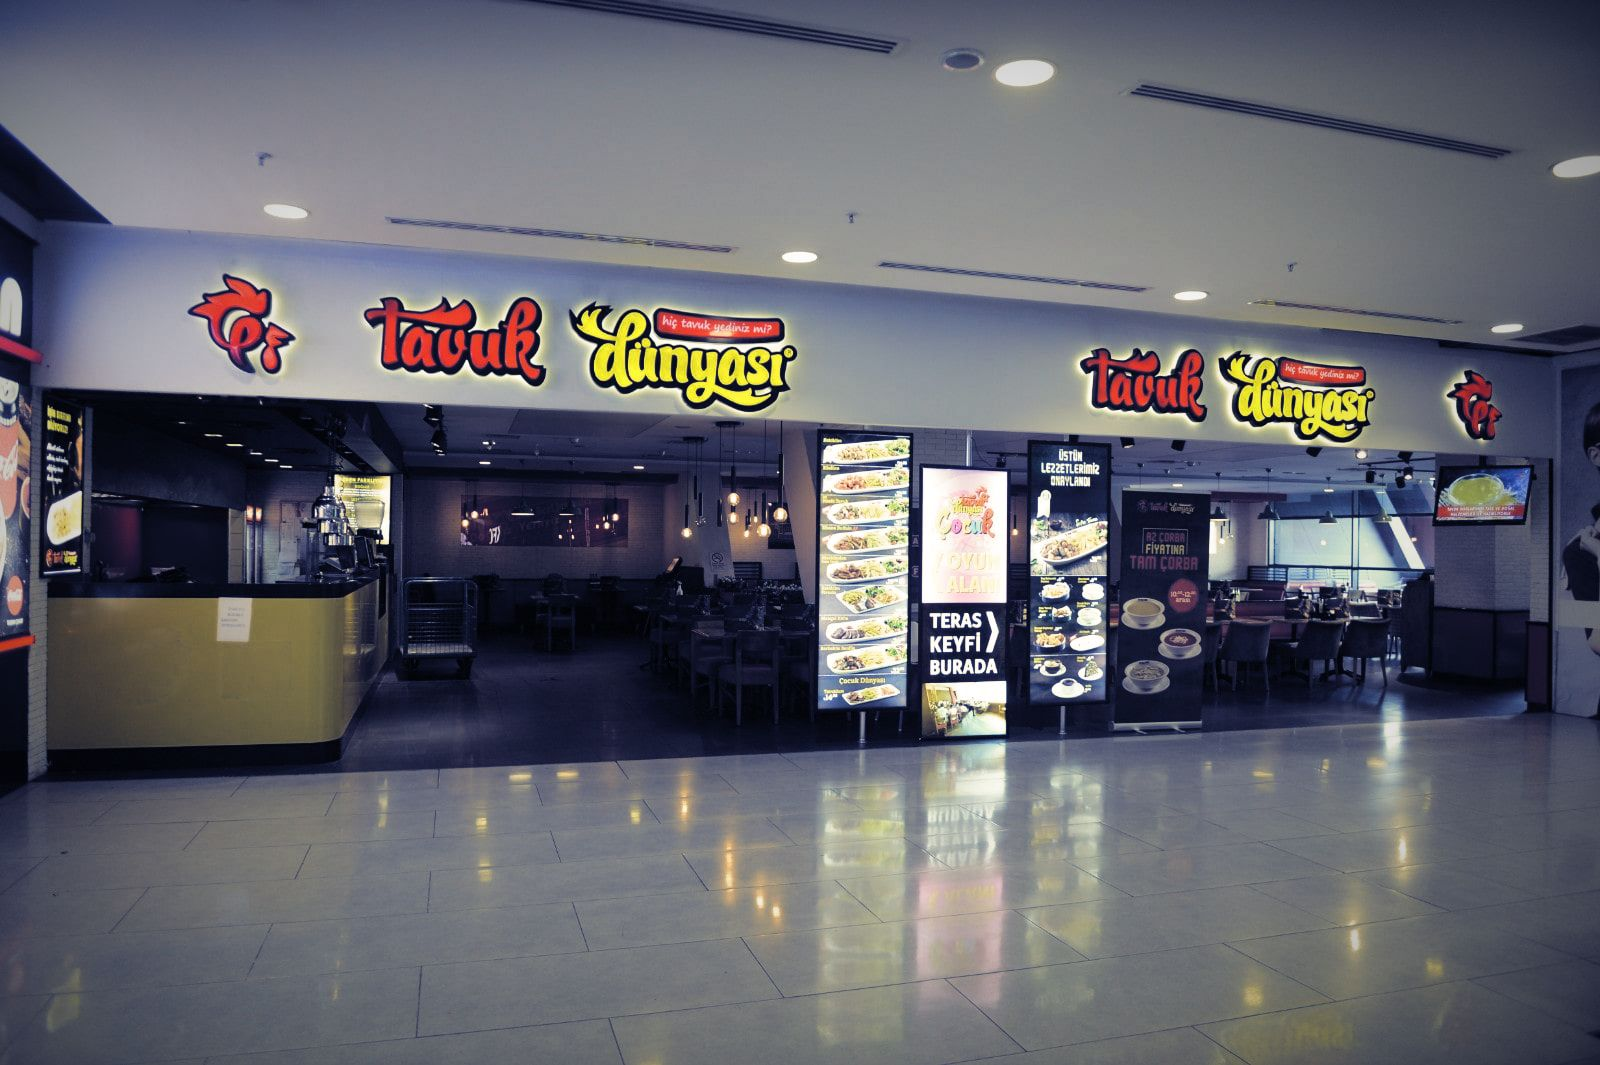 tavuk dunyasi franchise sartlari